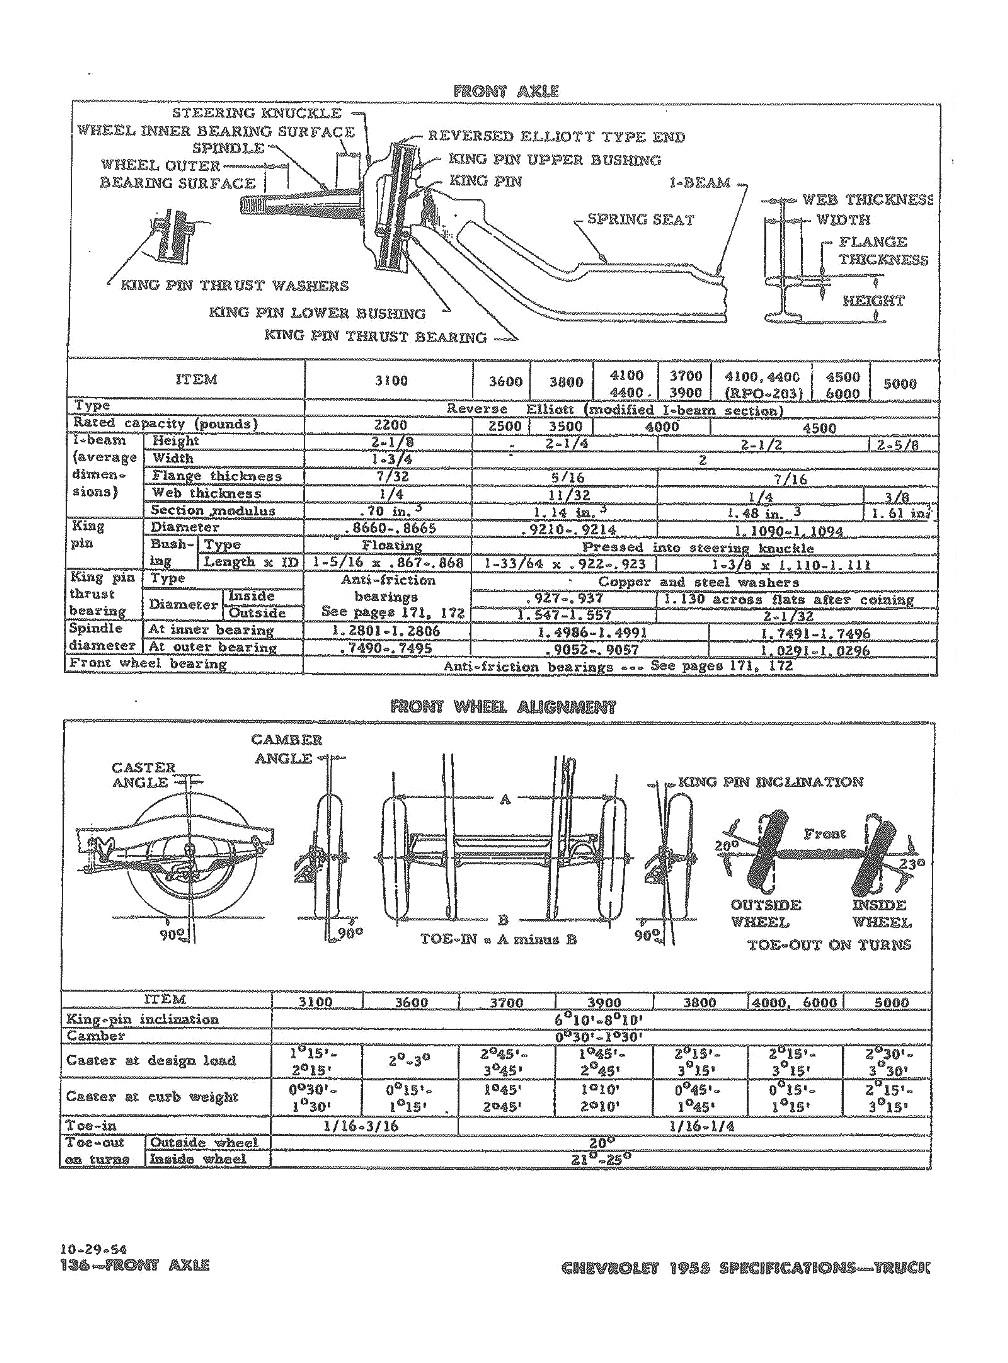 1955 Chevrolet Specifications 1st Series Trucks